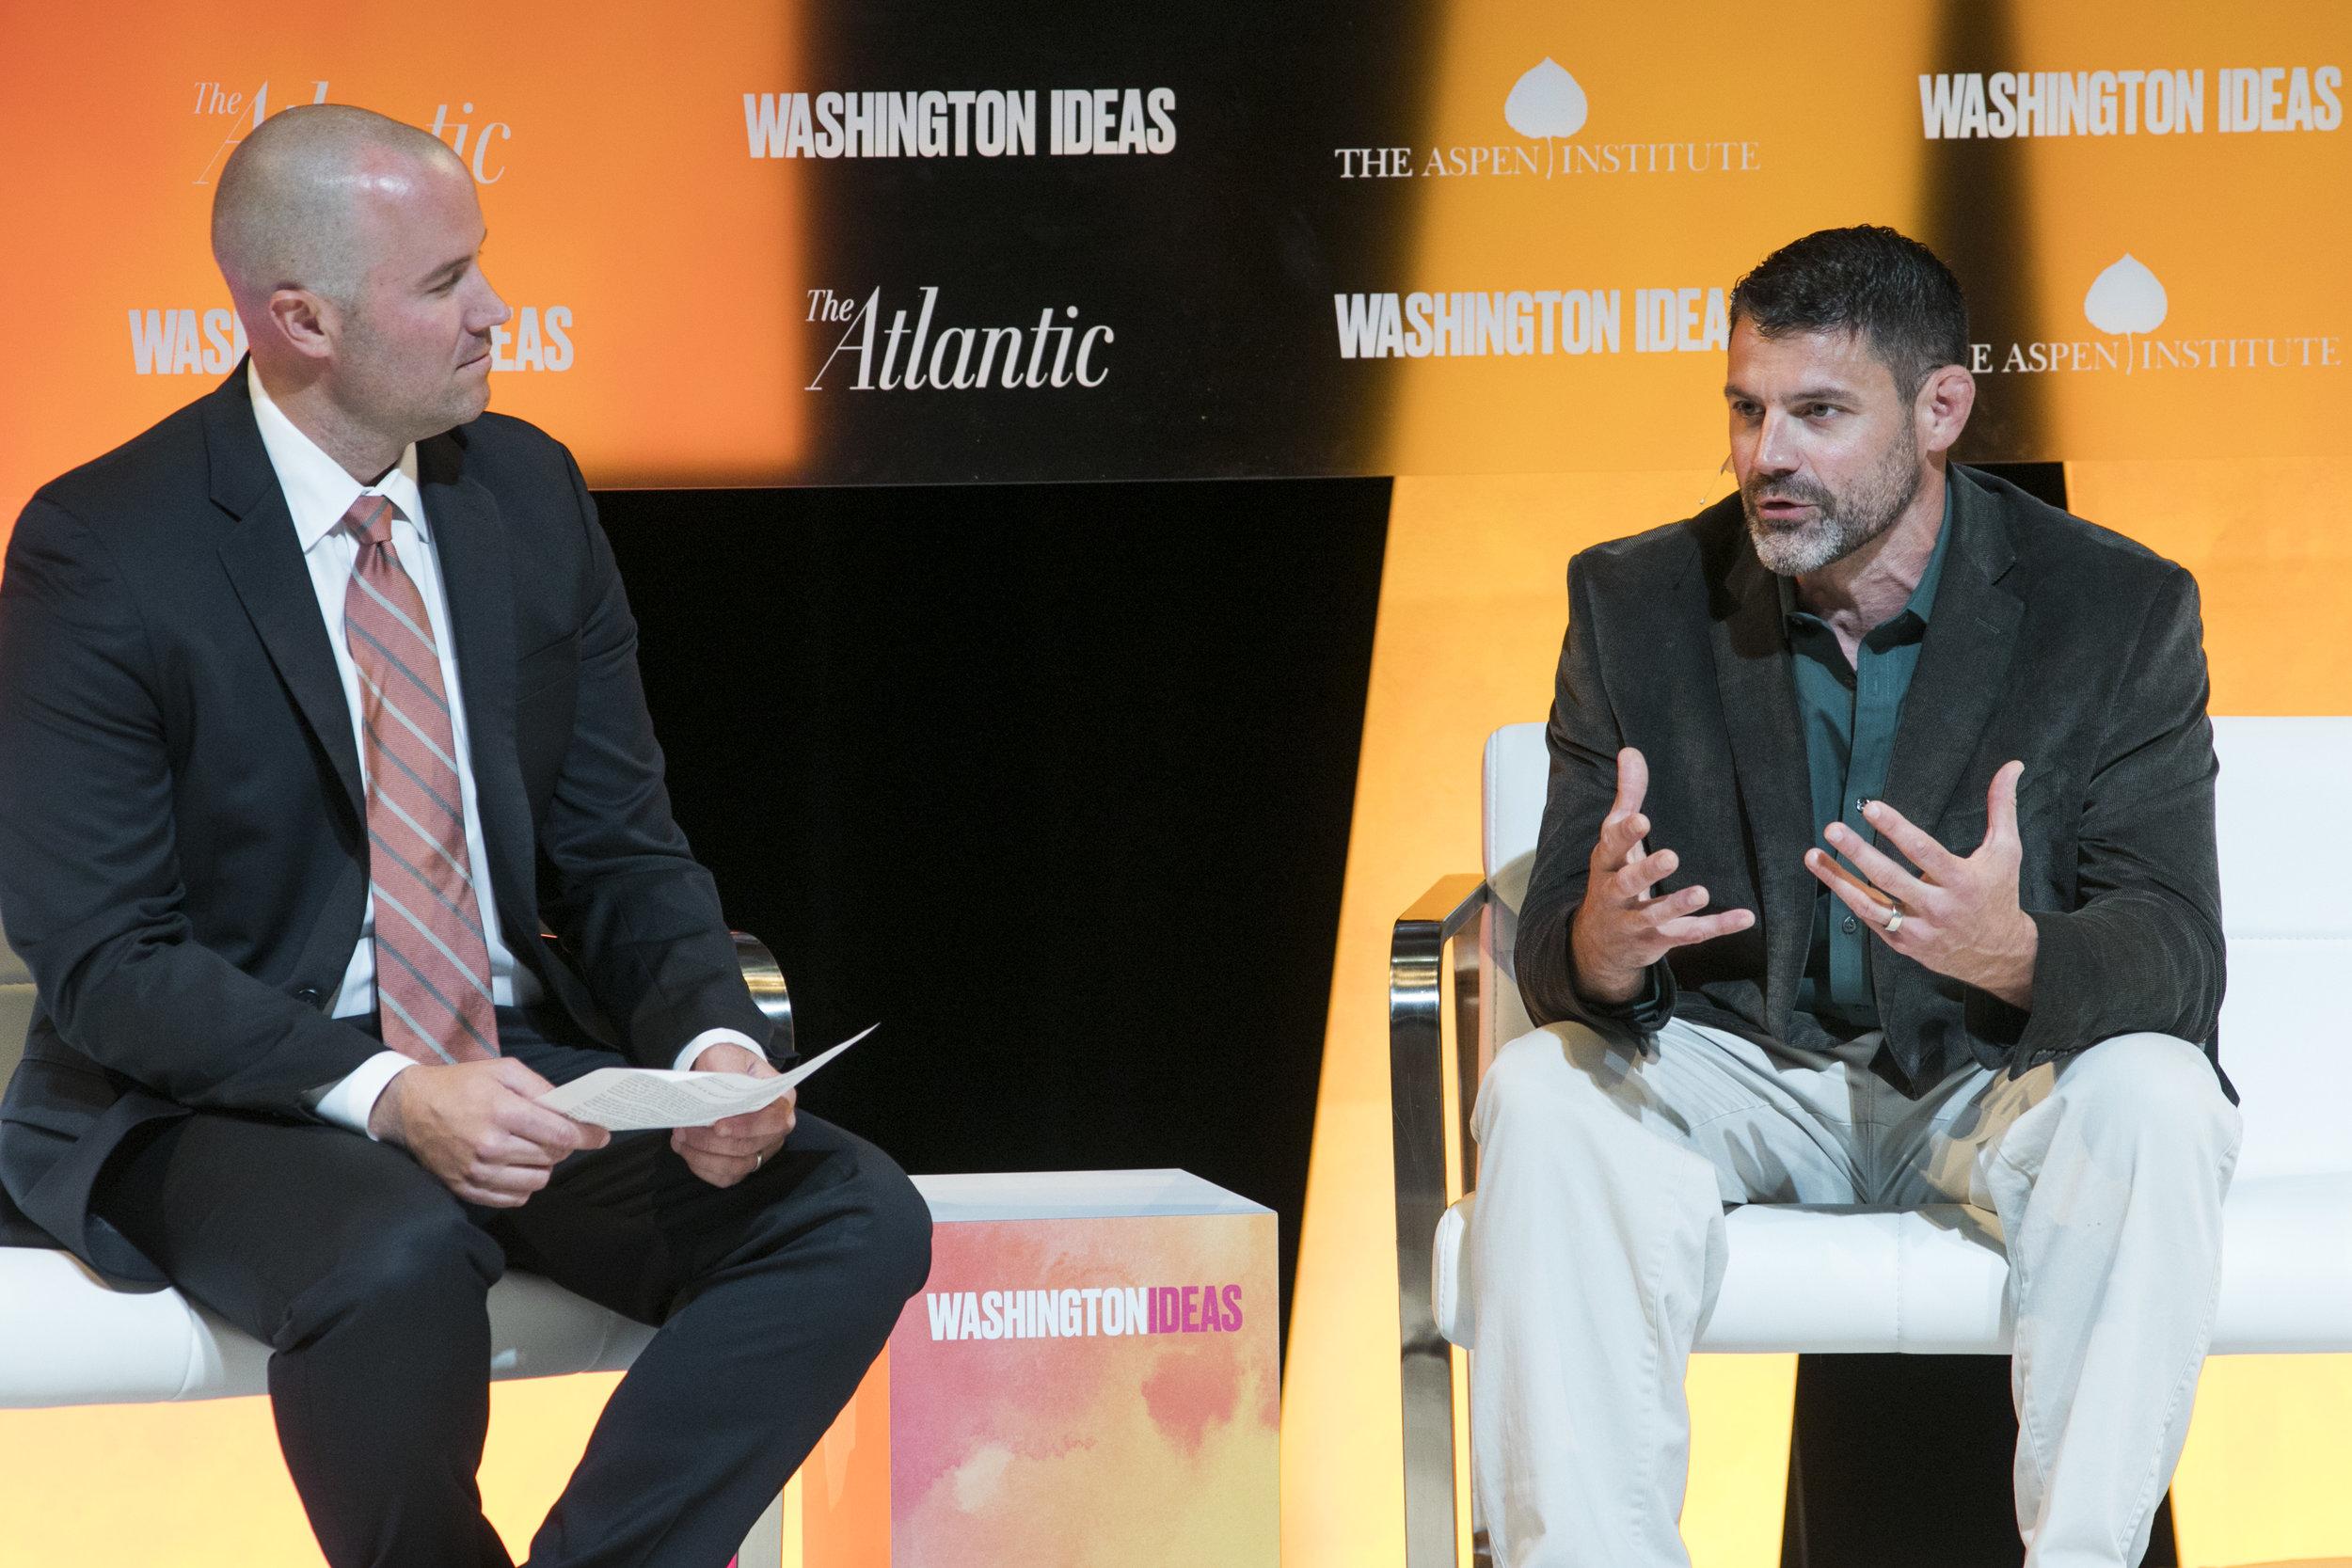 Dr. Bill Schindler sharing his research around ancestral diets at  Washington Ideas